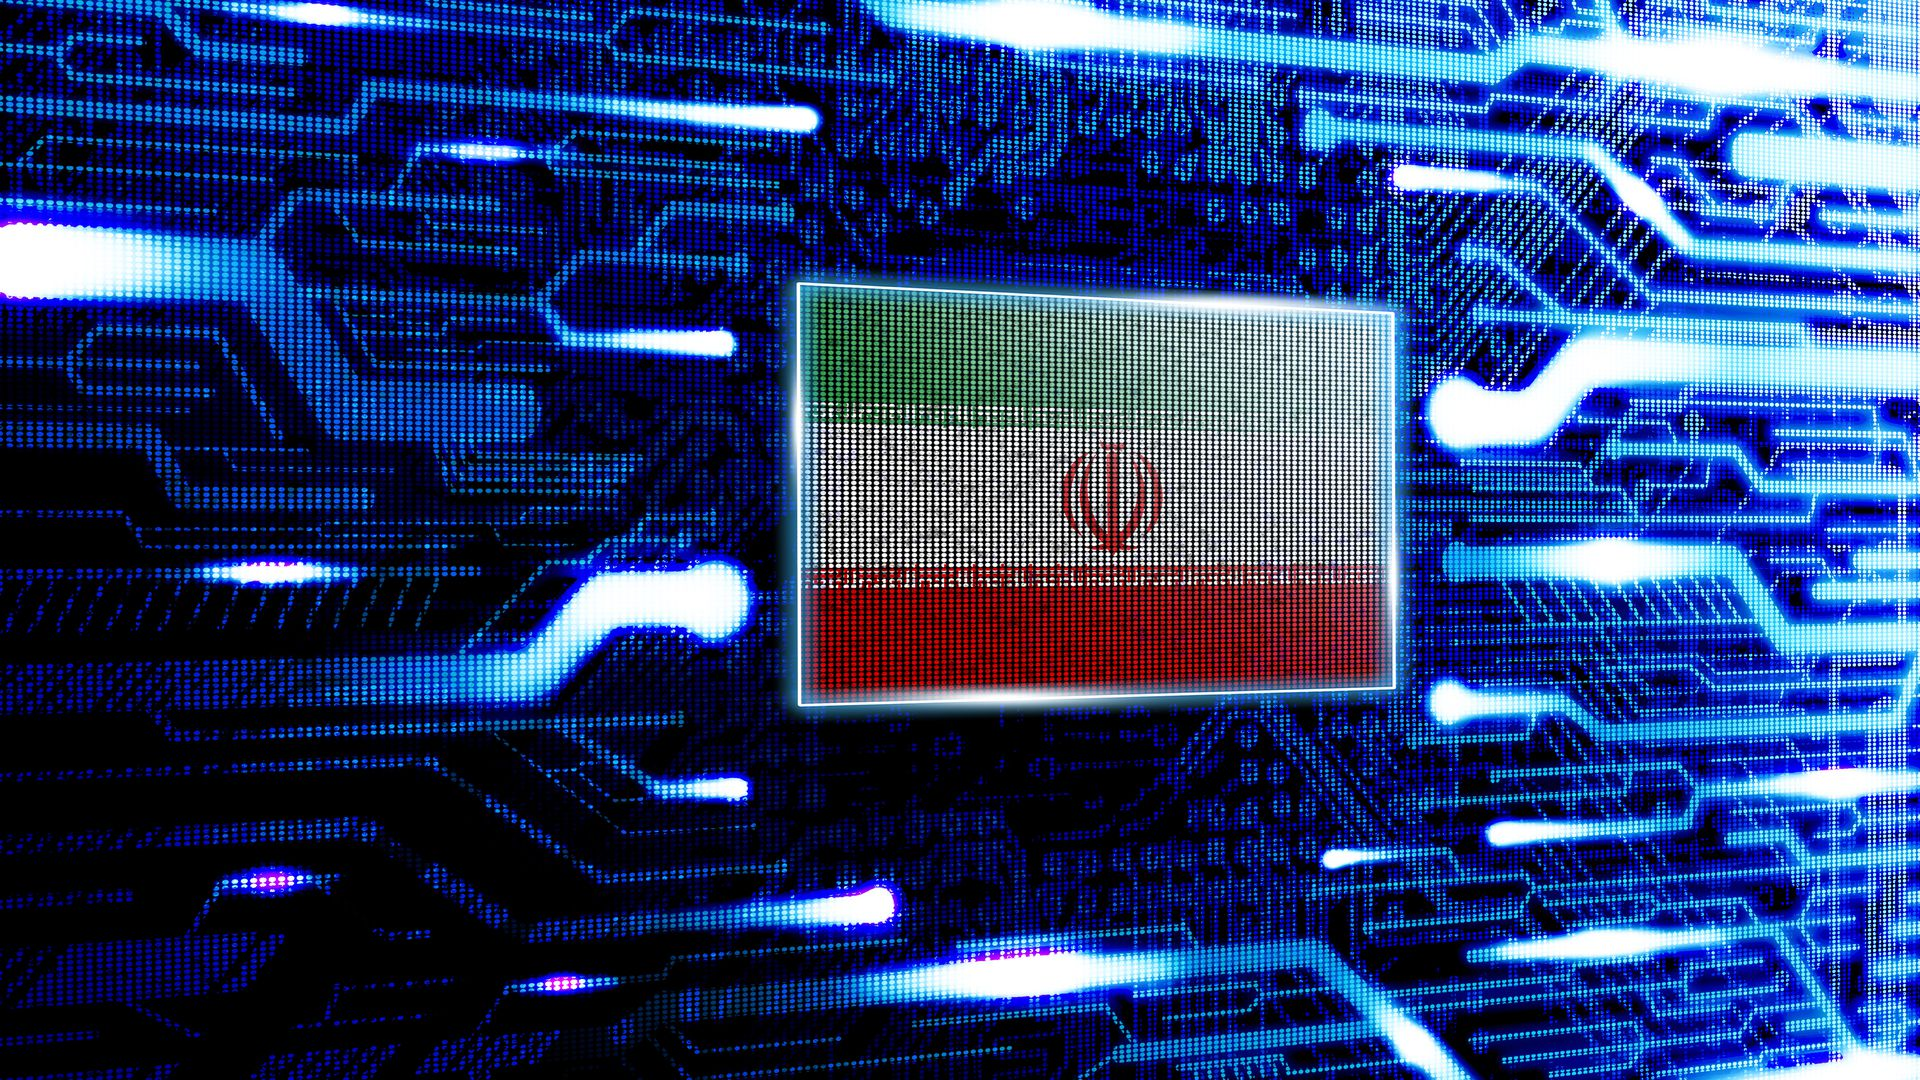 Iran cyber illustration